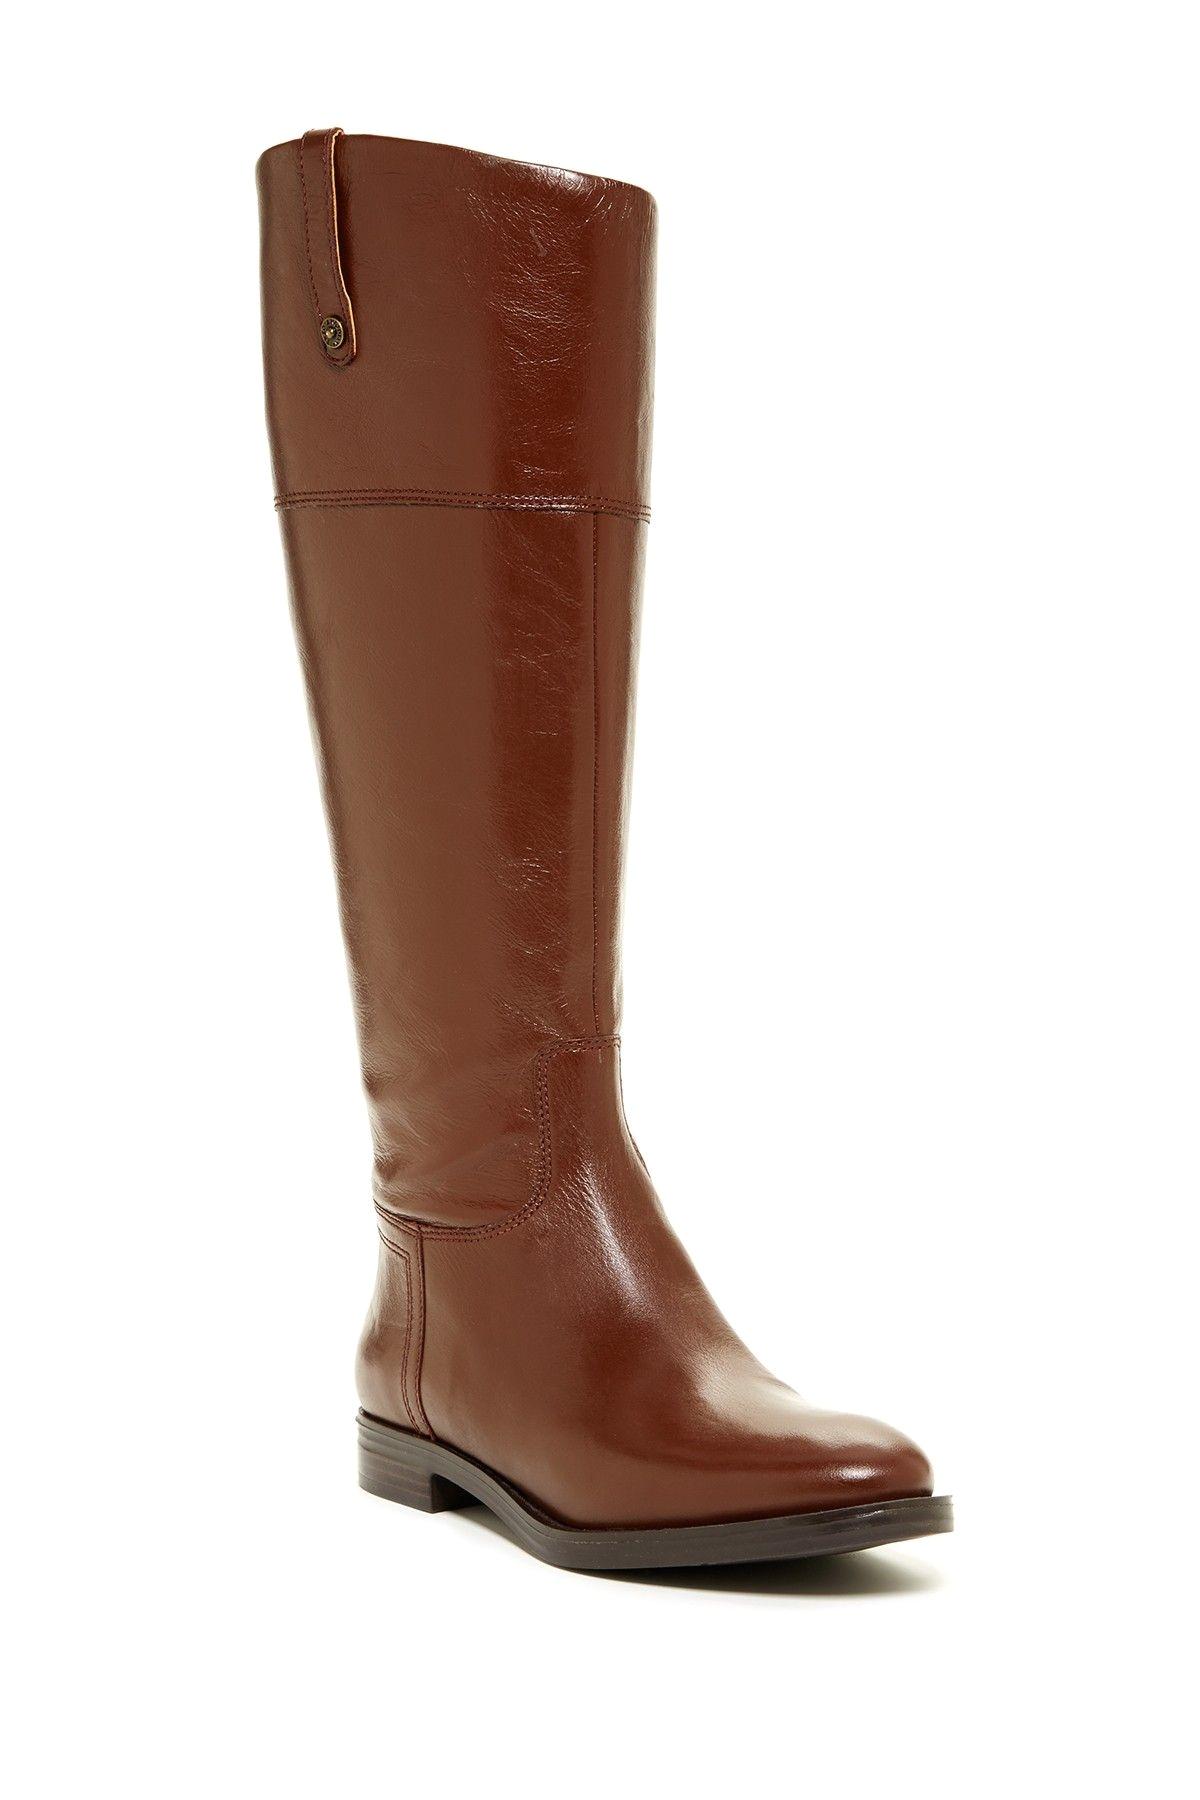 Frye Boots nordstrom Rack Ellerby Wide Calf Boot Calf Boots nordstrom and Fall Fashion